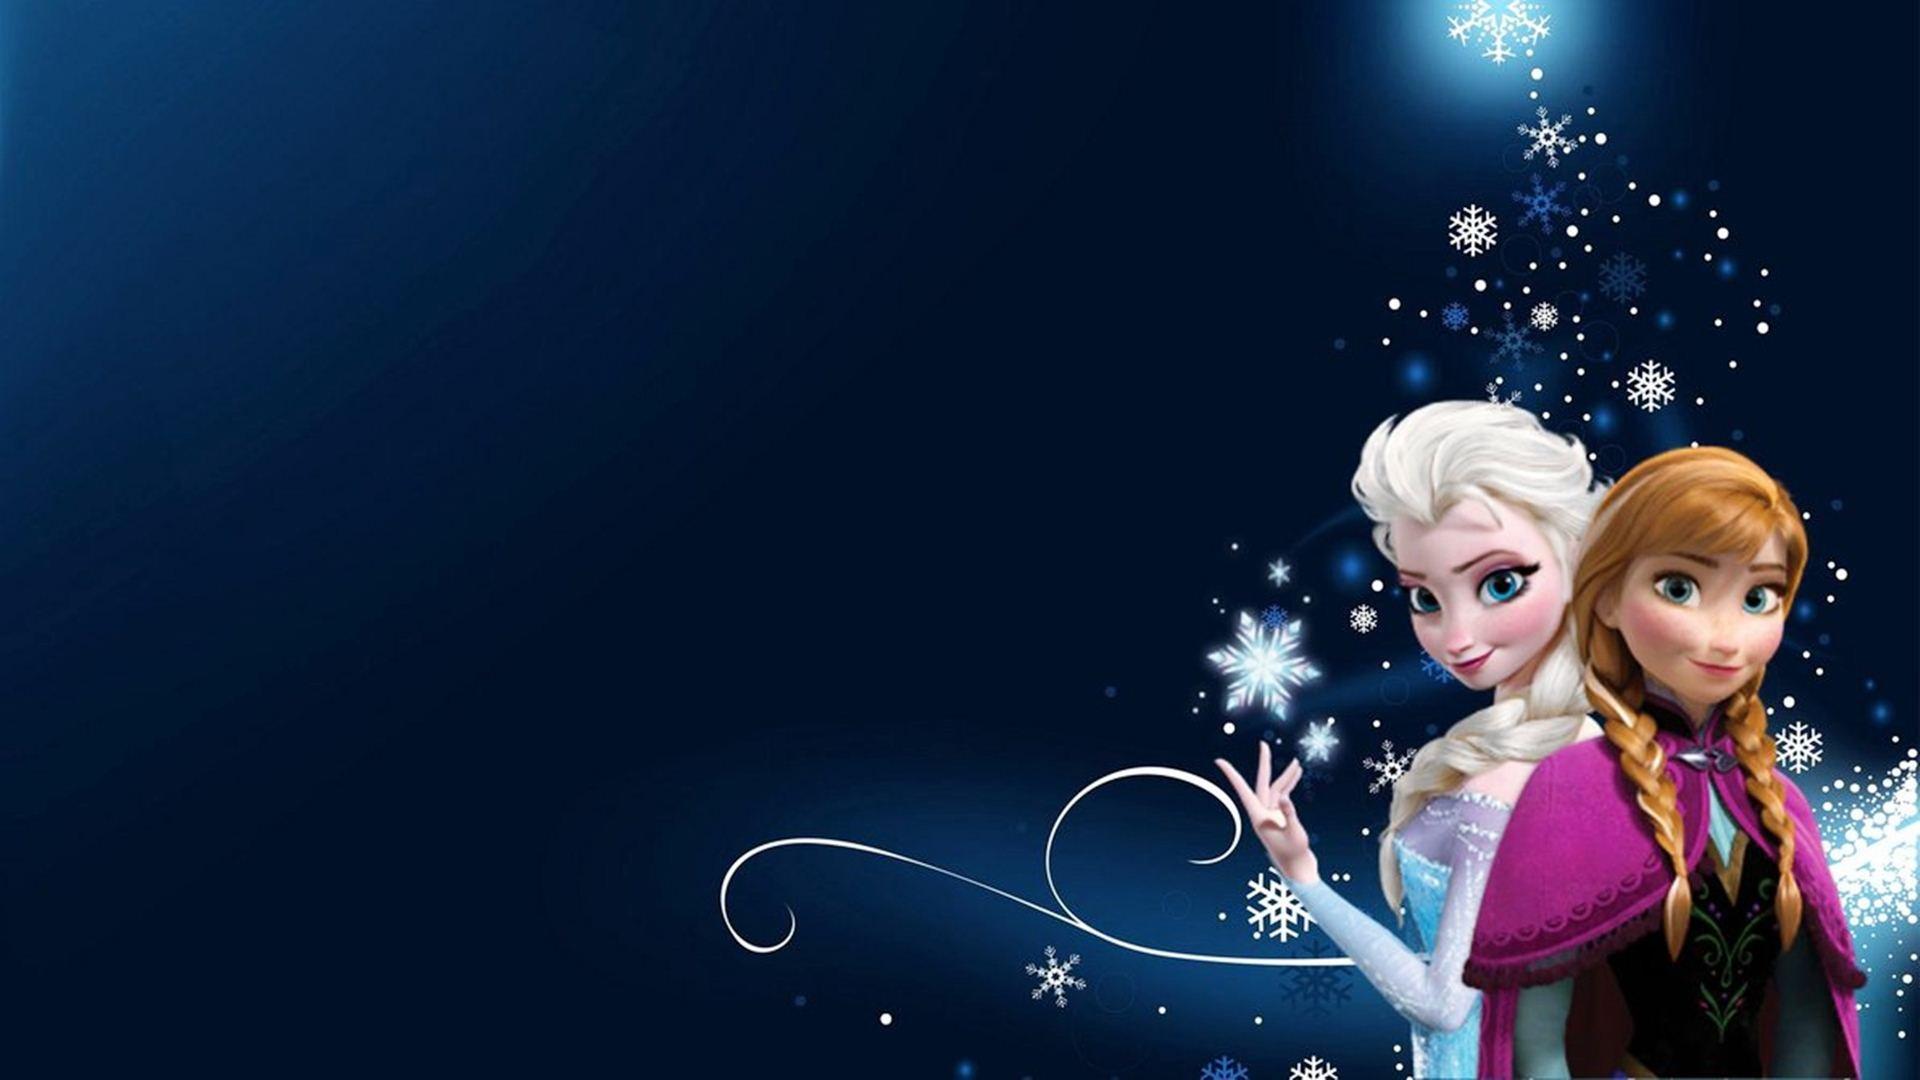 Www Animation Wallpaper Com Frozen Animation Adventure Comedy Family Musical Fantasy